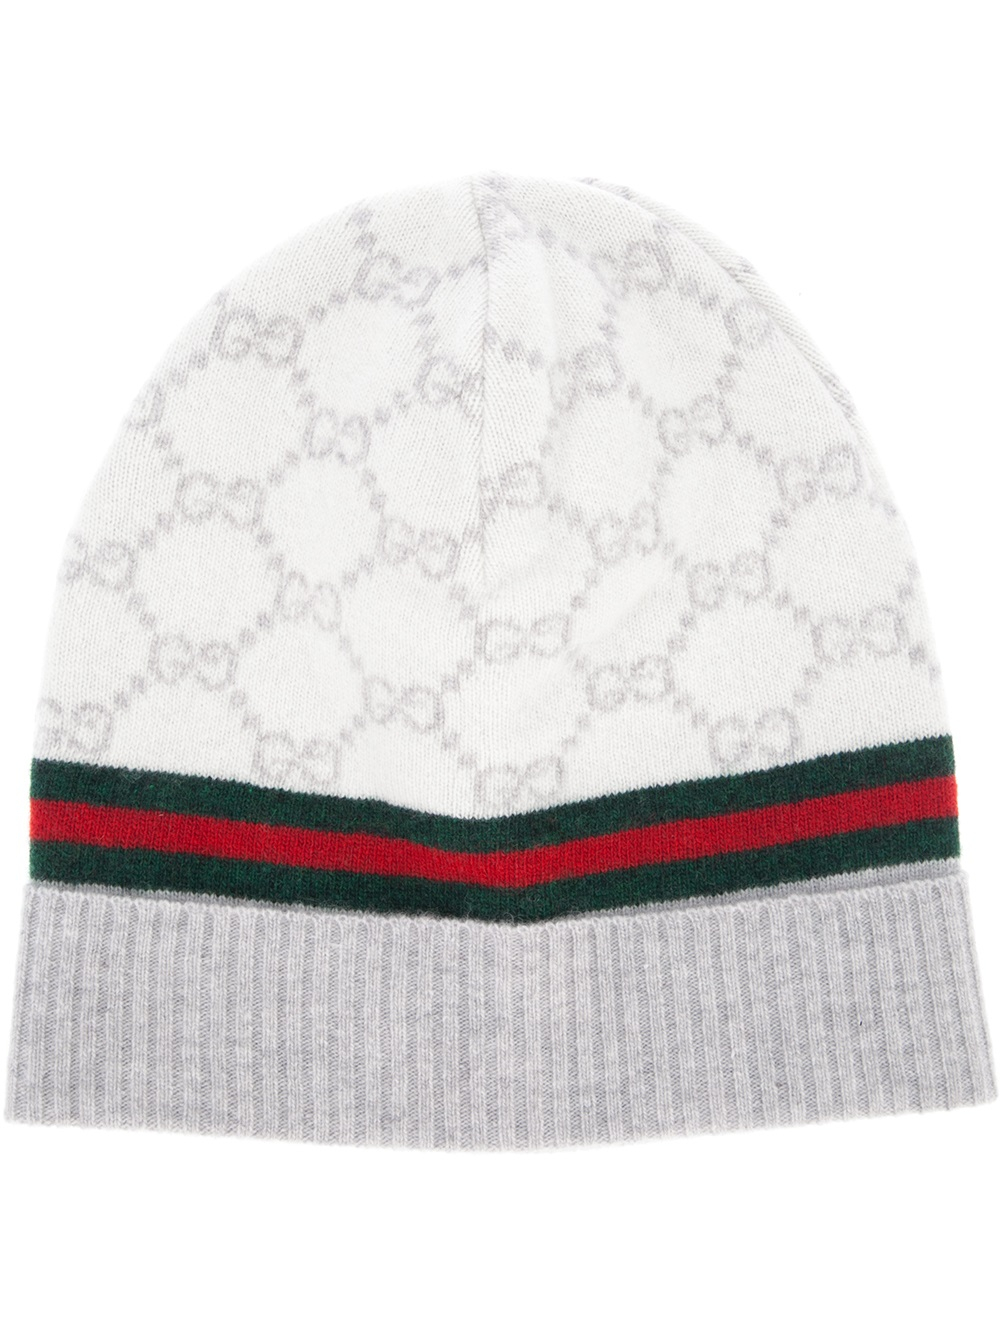 Lyst - Gucci Monogram Beanie Hat in Natural 3e883c6964a